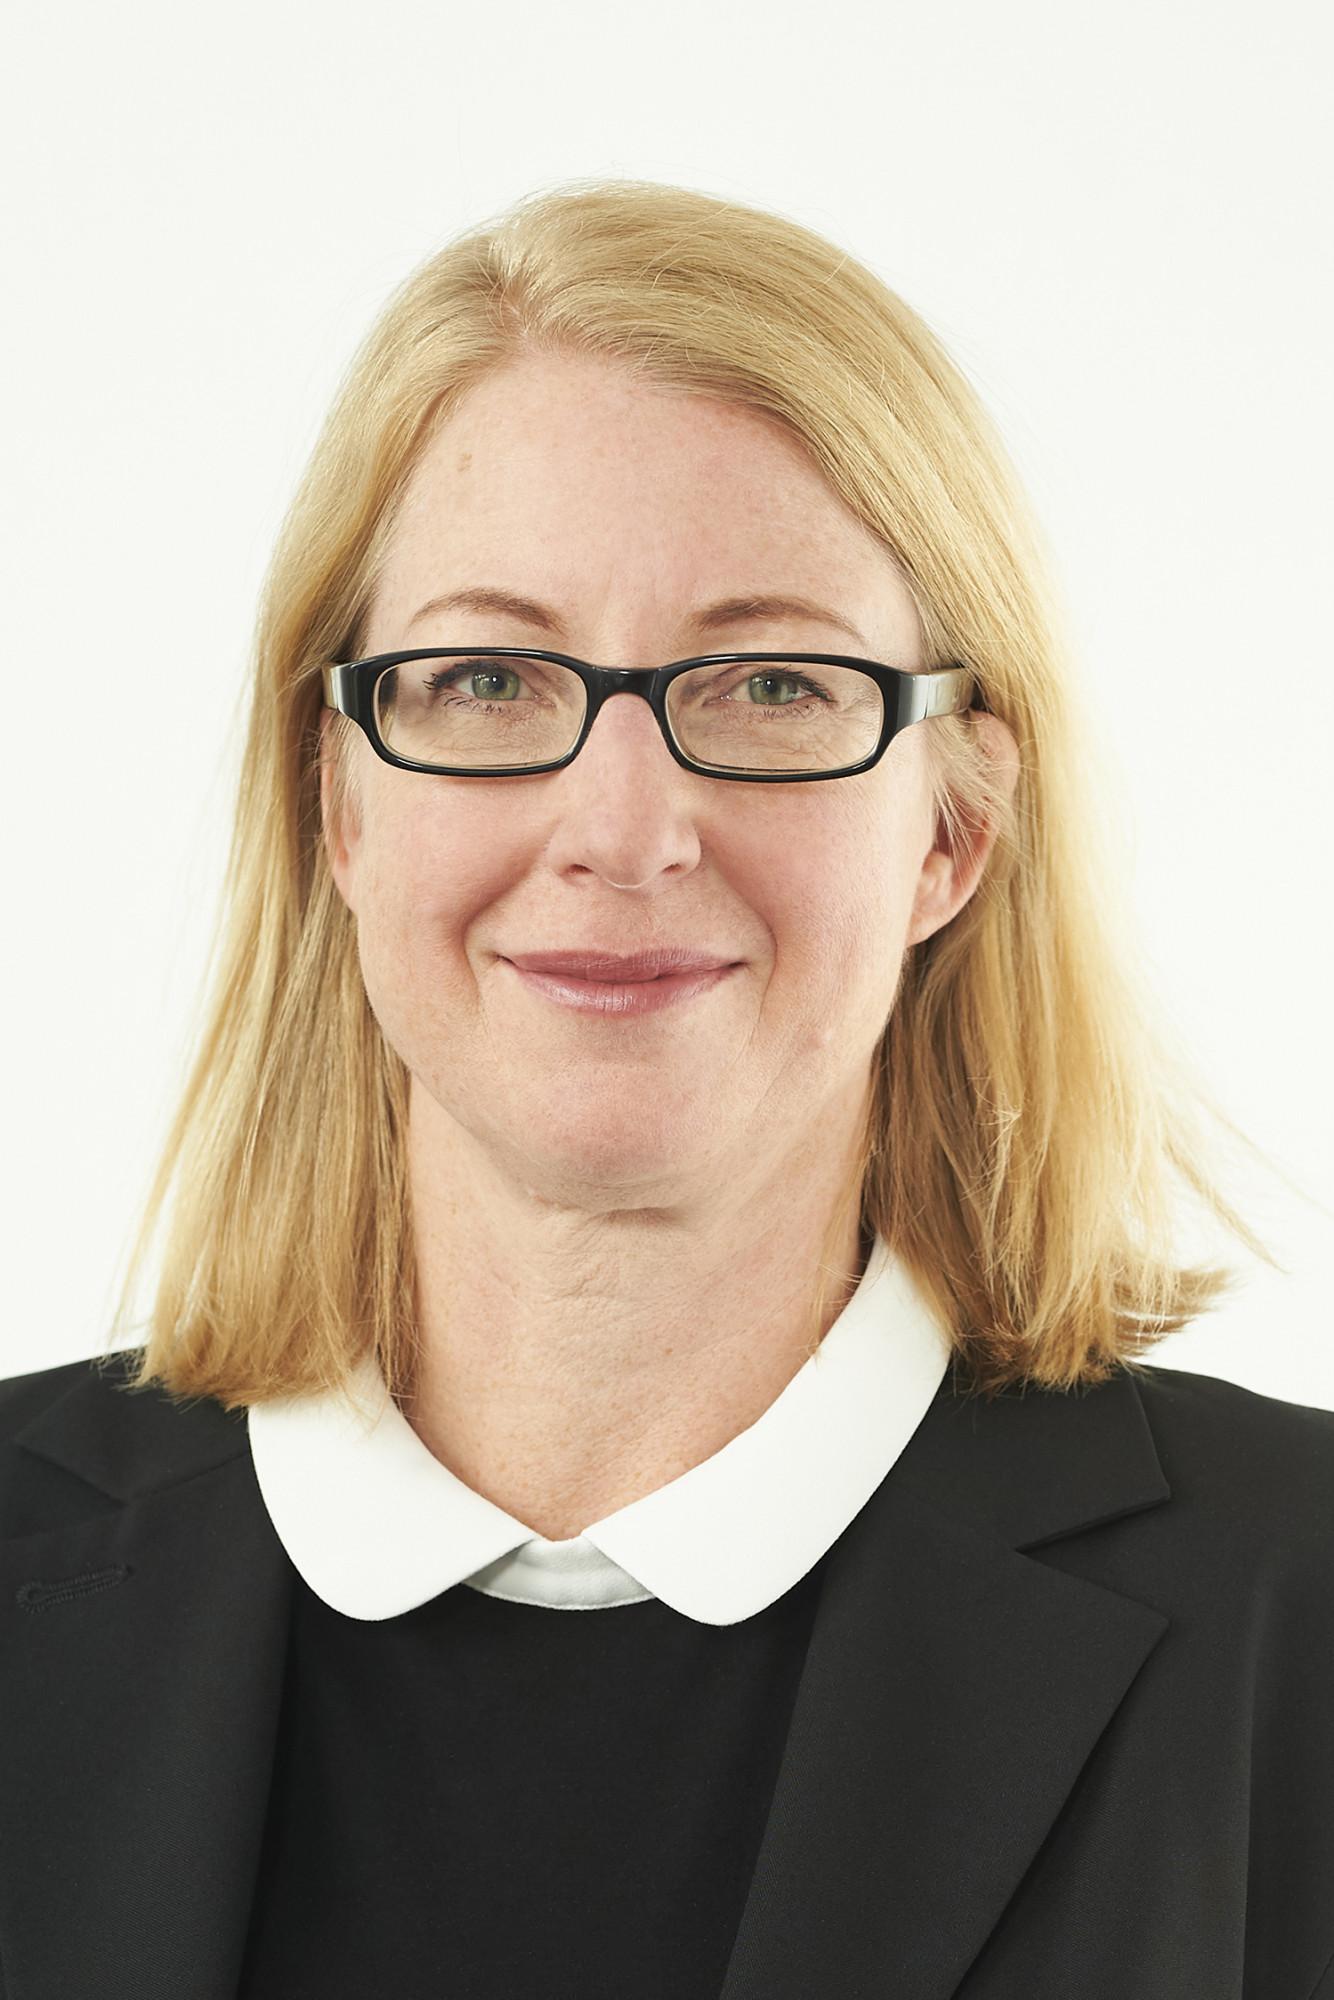 Melani Brinkmann